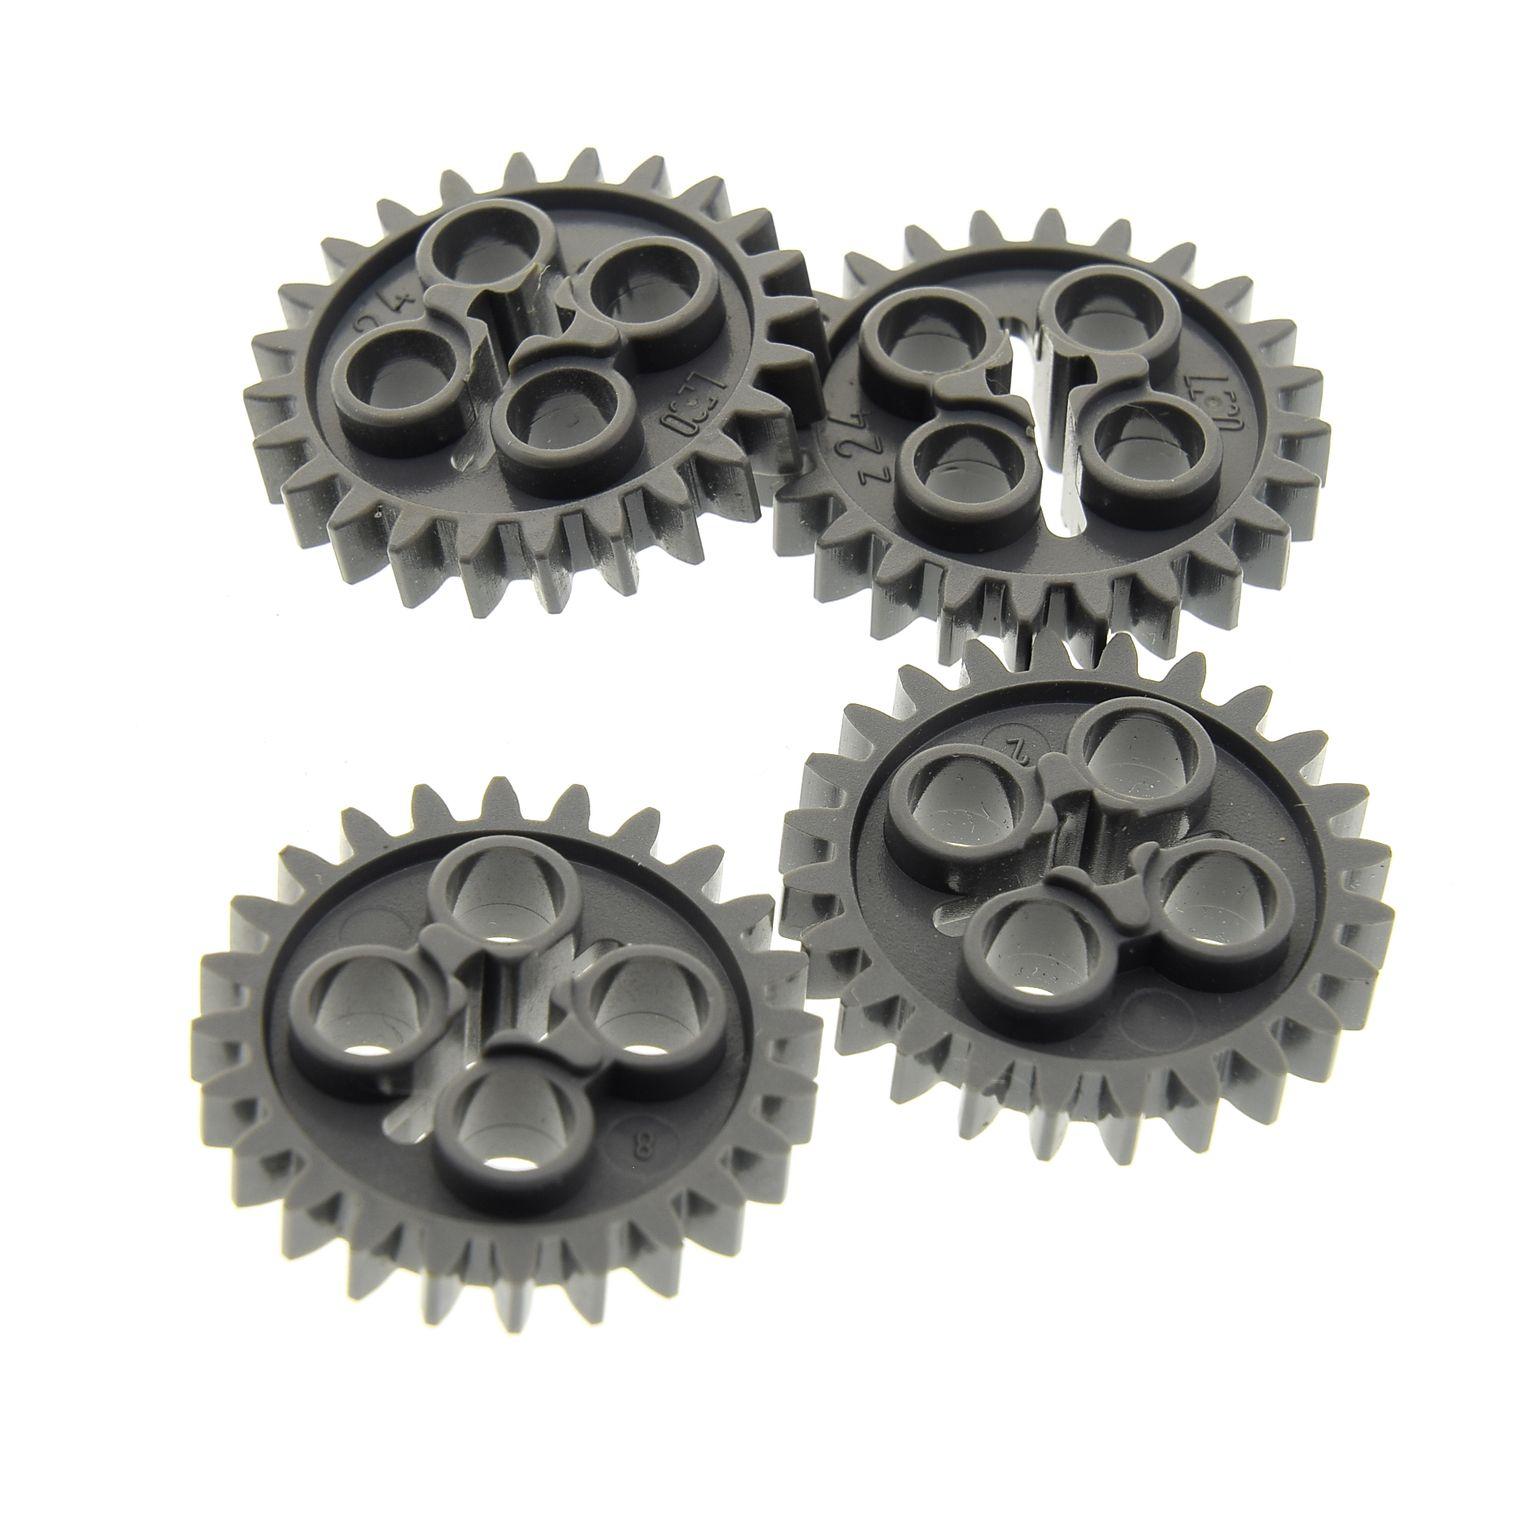 4 X Lego Technic Zahnrad Neu Dunkel Grau Z24 Zahnräder Zähne Rad